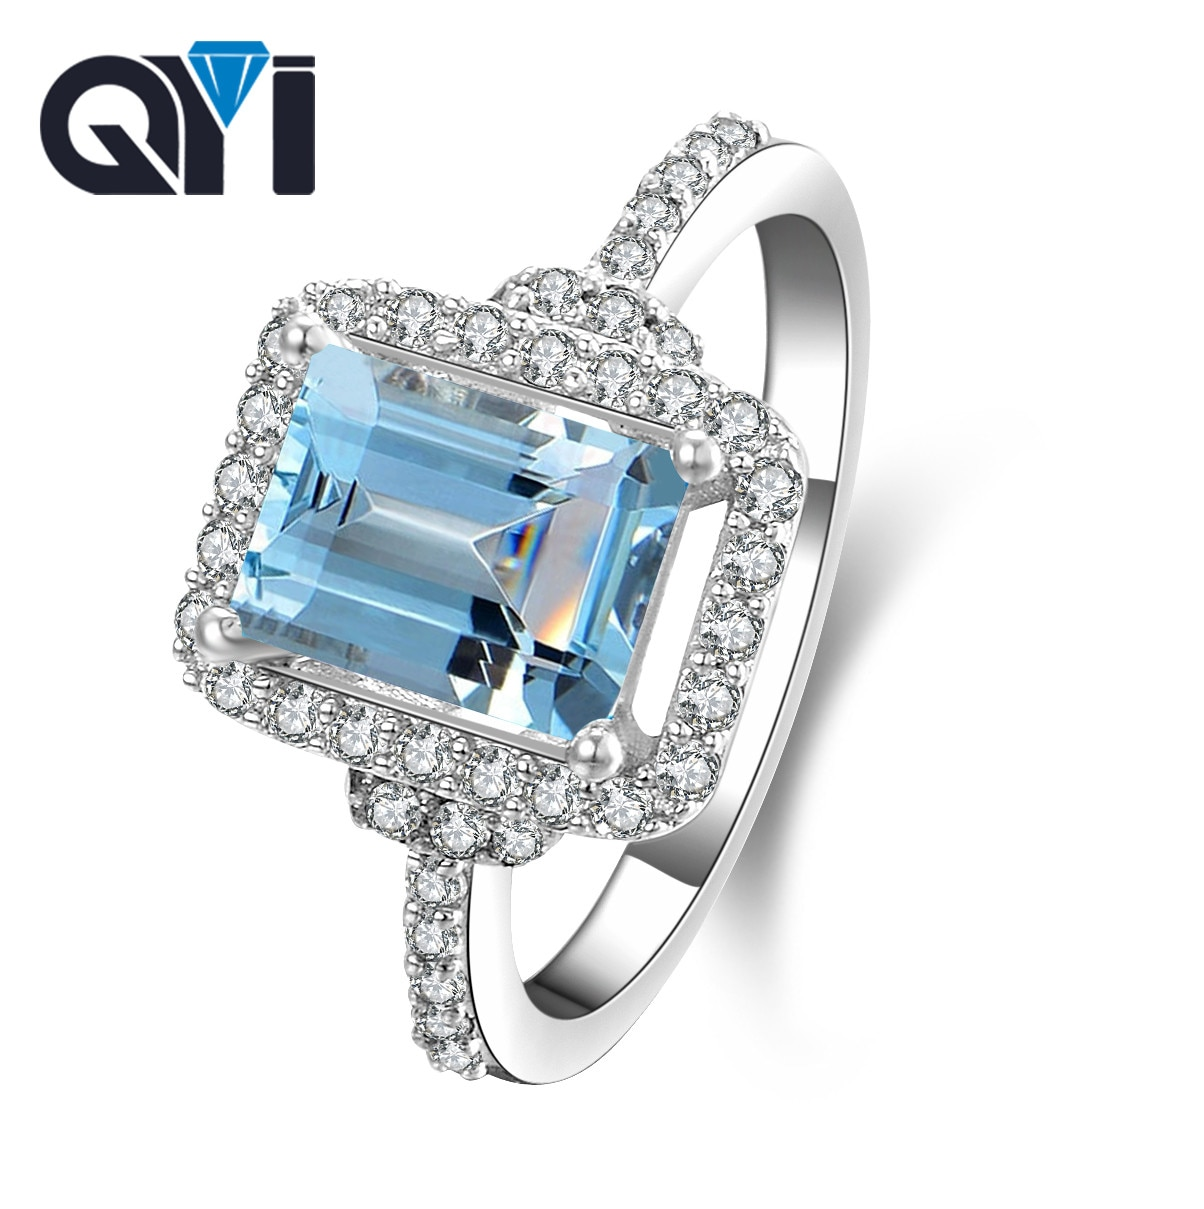 QYI anillo de topacio Natural de Plata de Ley 925 auténtica 1,5 ct, anillos de gemas naturales con corte de Esmeralda azul cielo para mujer, joyería fina